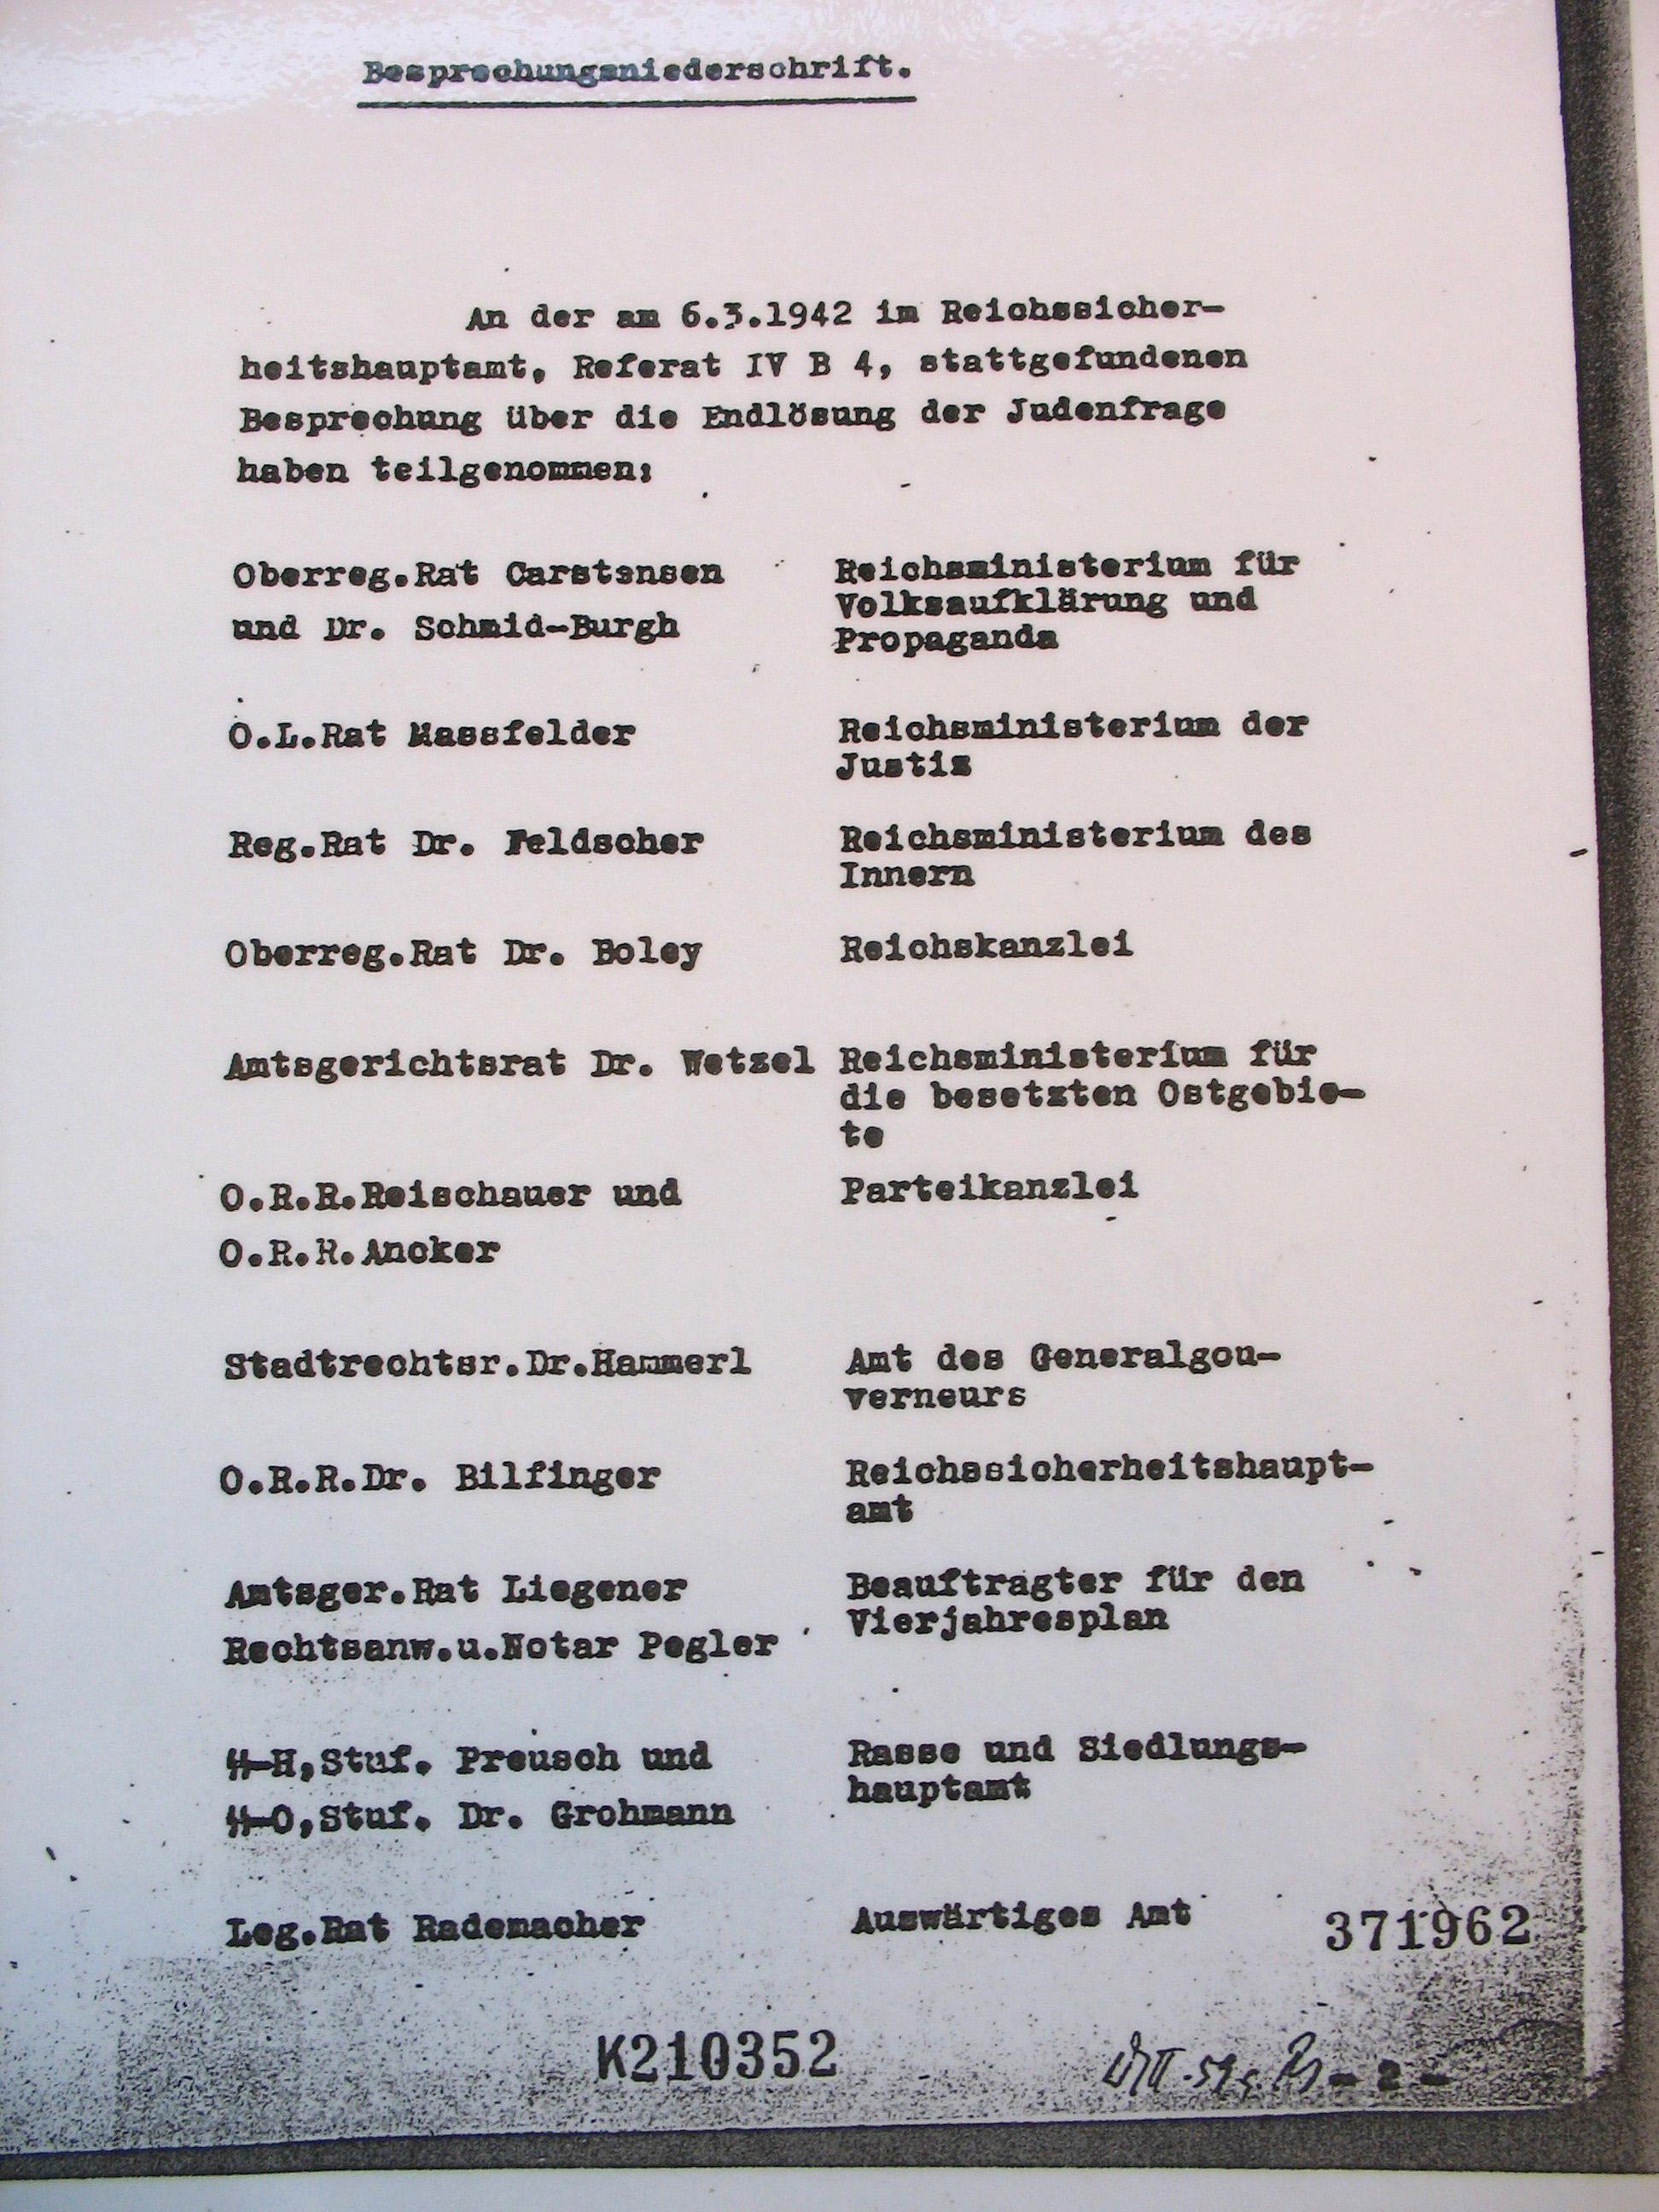 arzt mikrobiologe münchen